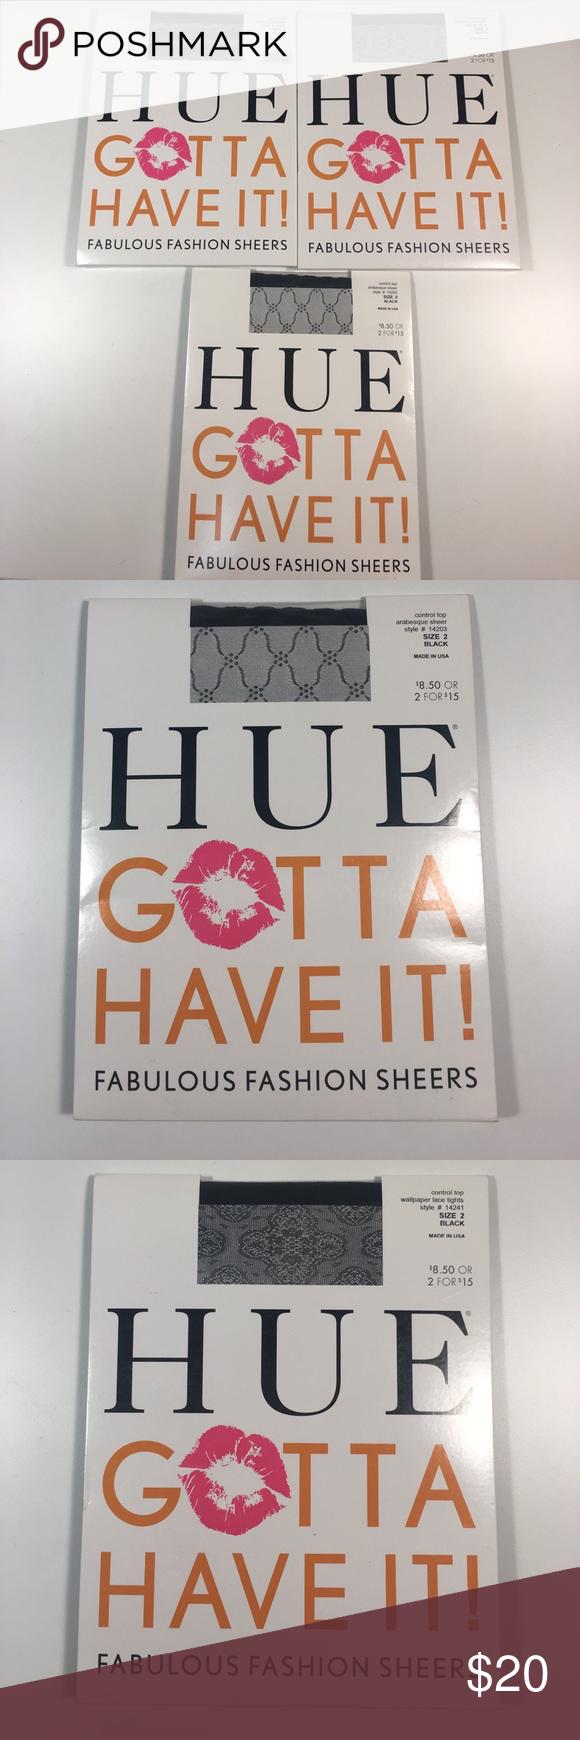 666e1f478da14 HUE Gotta Have It! Fashion Sheers Size 2, Lot of 3 Brand new lot of ...